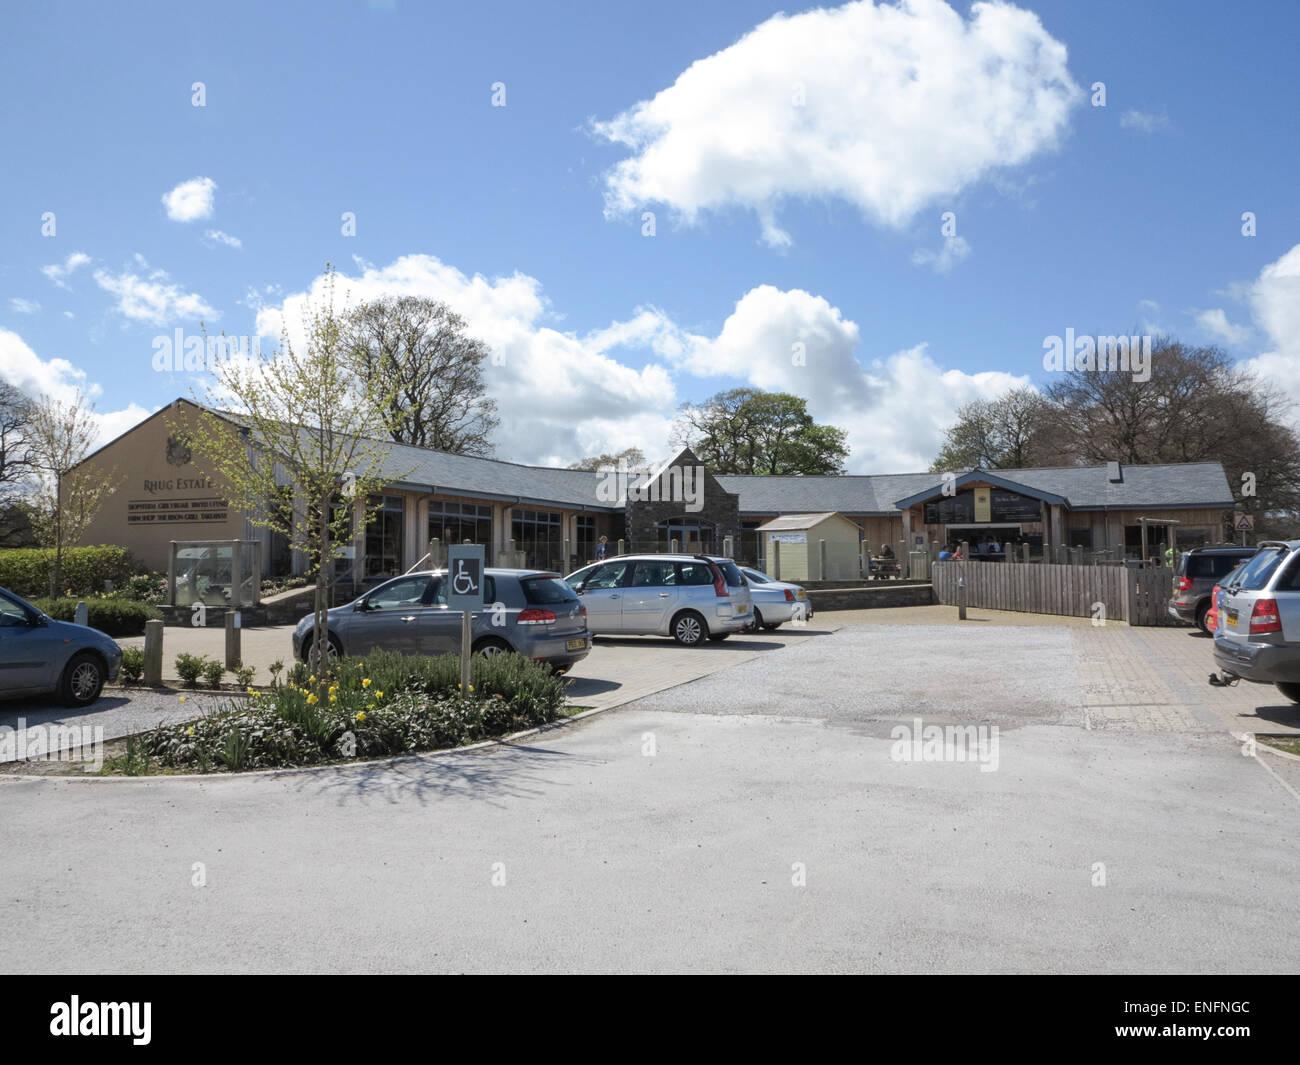 Rhug Estate Farm Shop and Takeaway - Stock Image